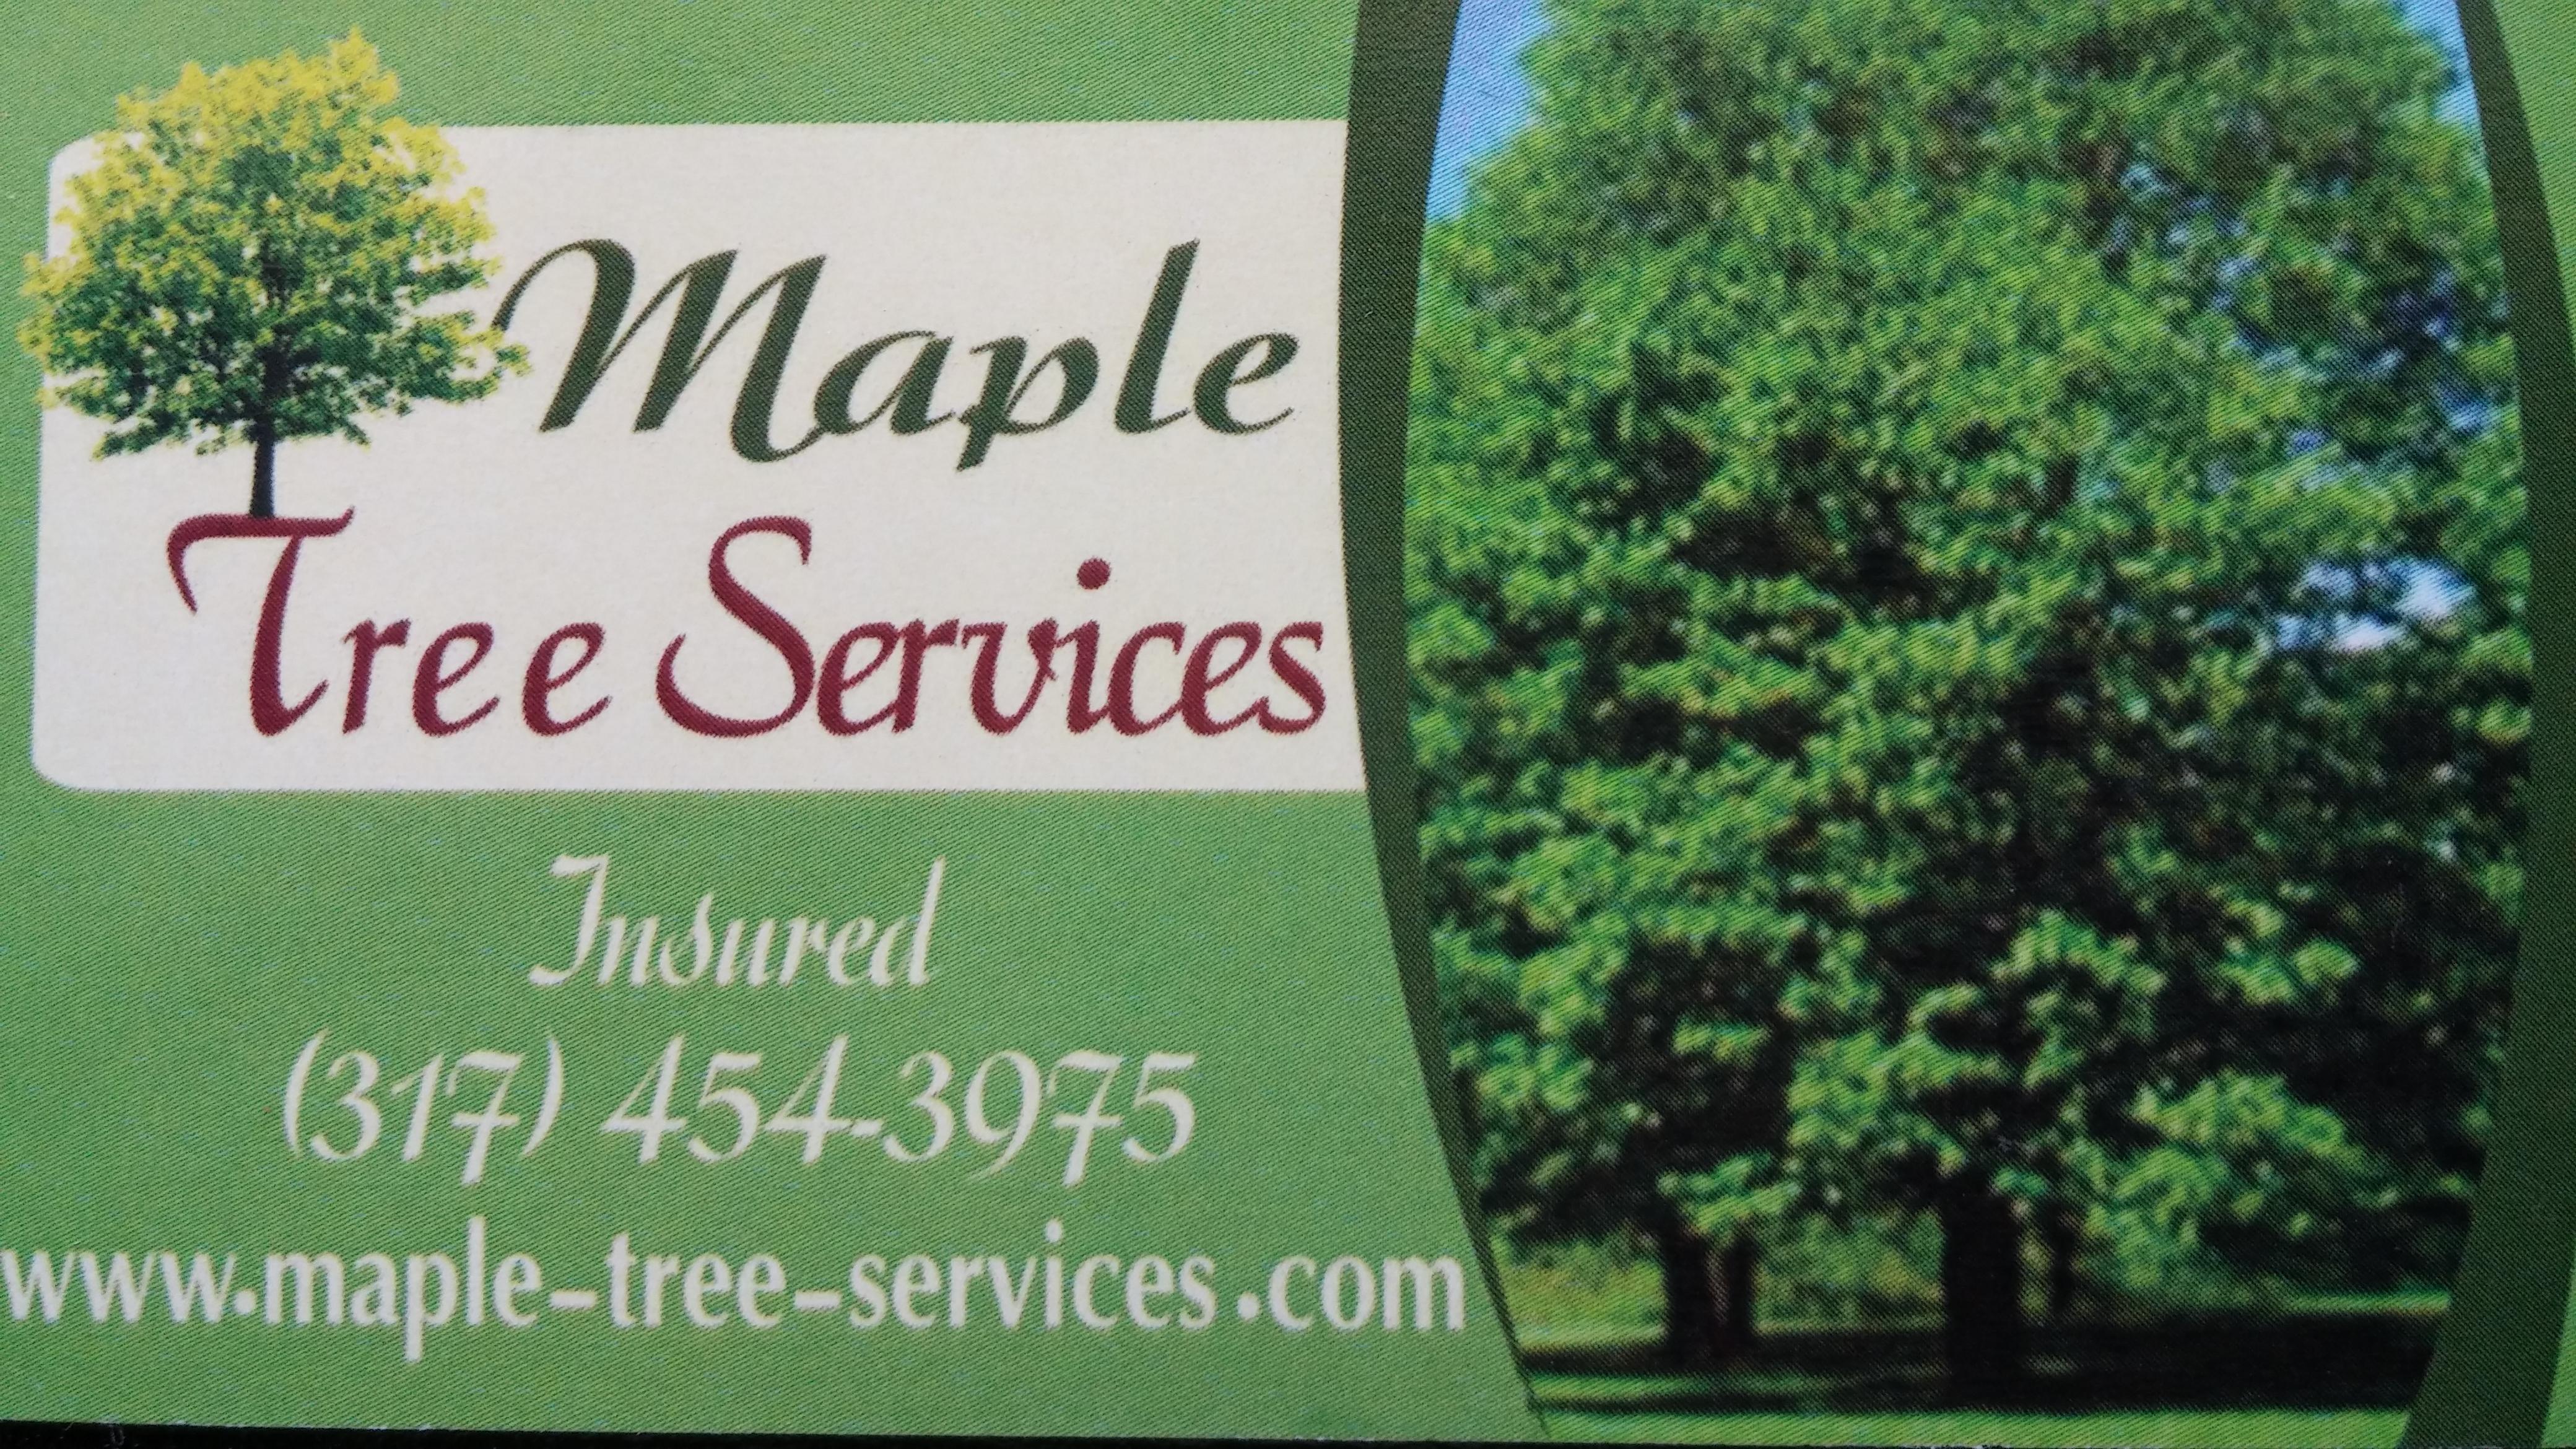 Maple tree service